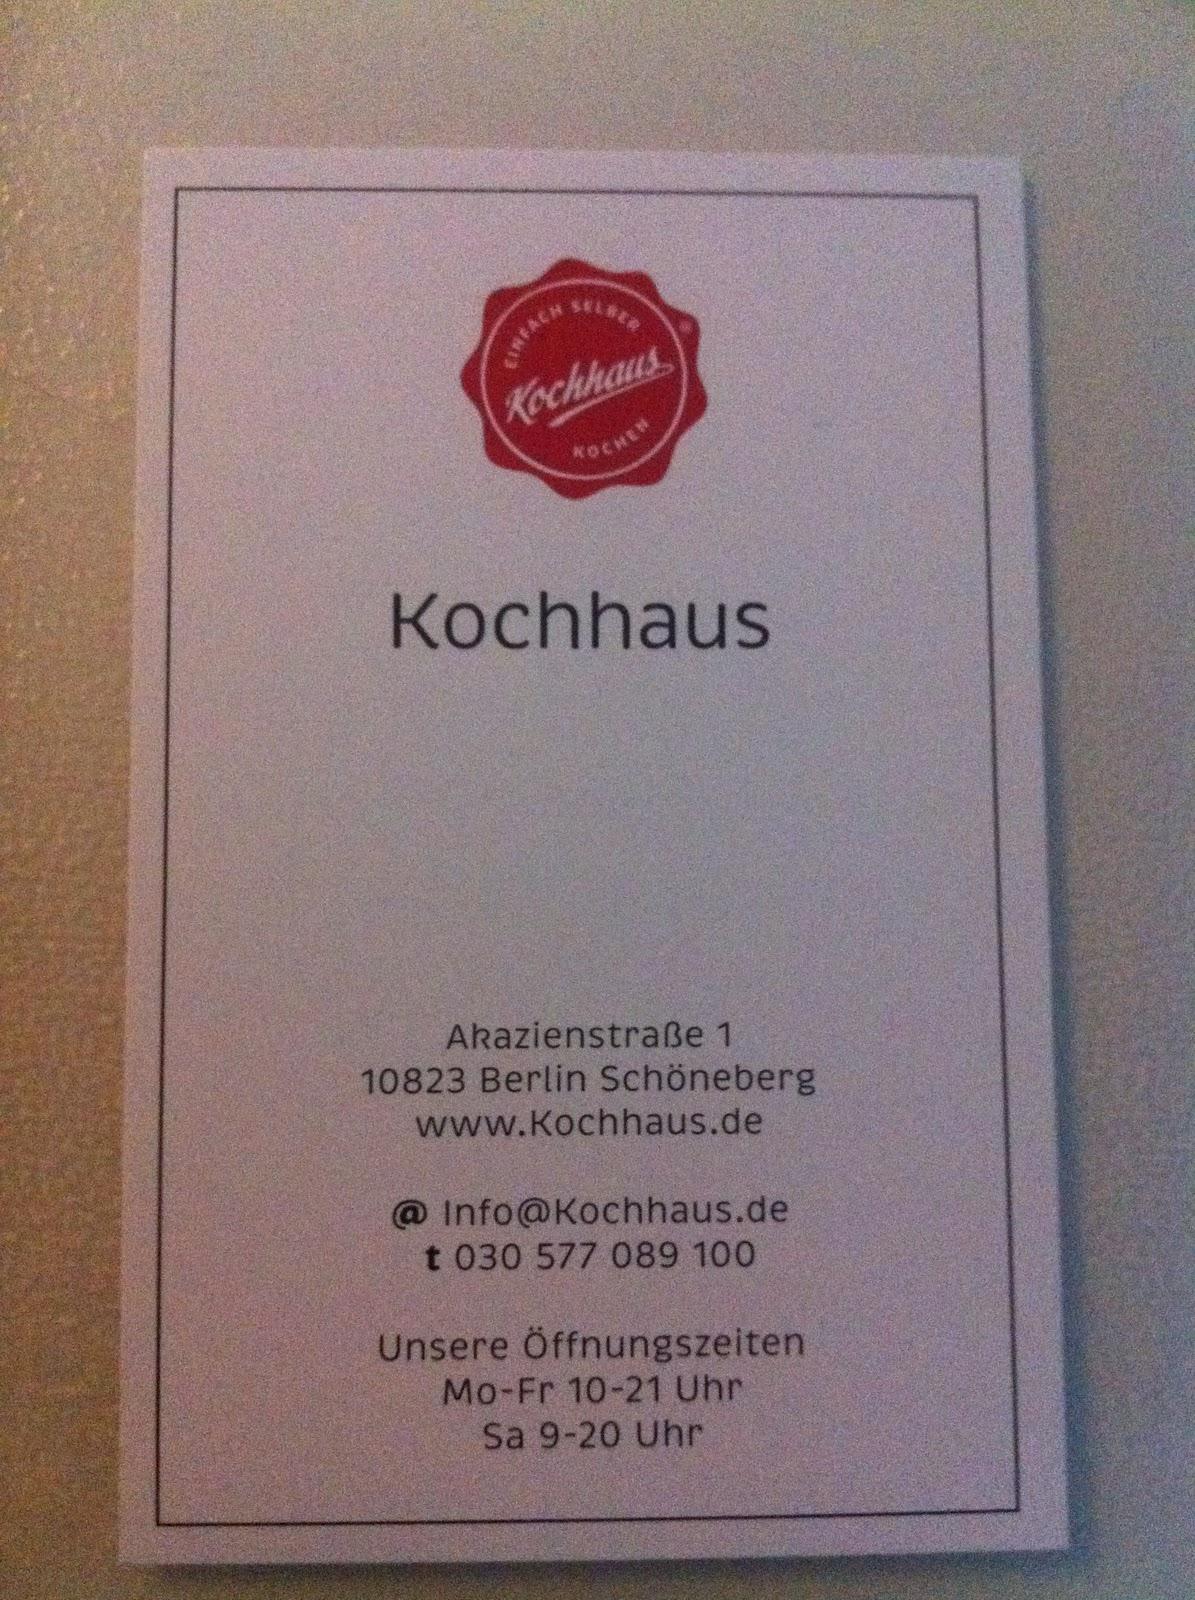 trendqueen kochhaus selber kochen leicht gemacht trendqueen on tour. Black Bedroom Furniture Sets. Home Design Ideas